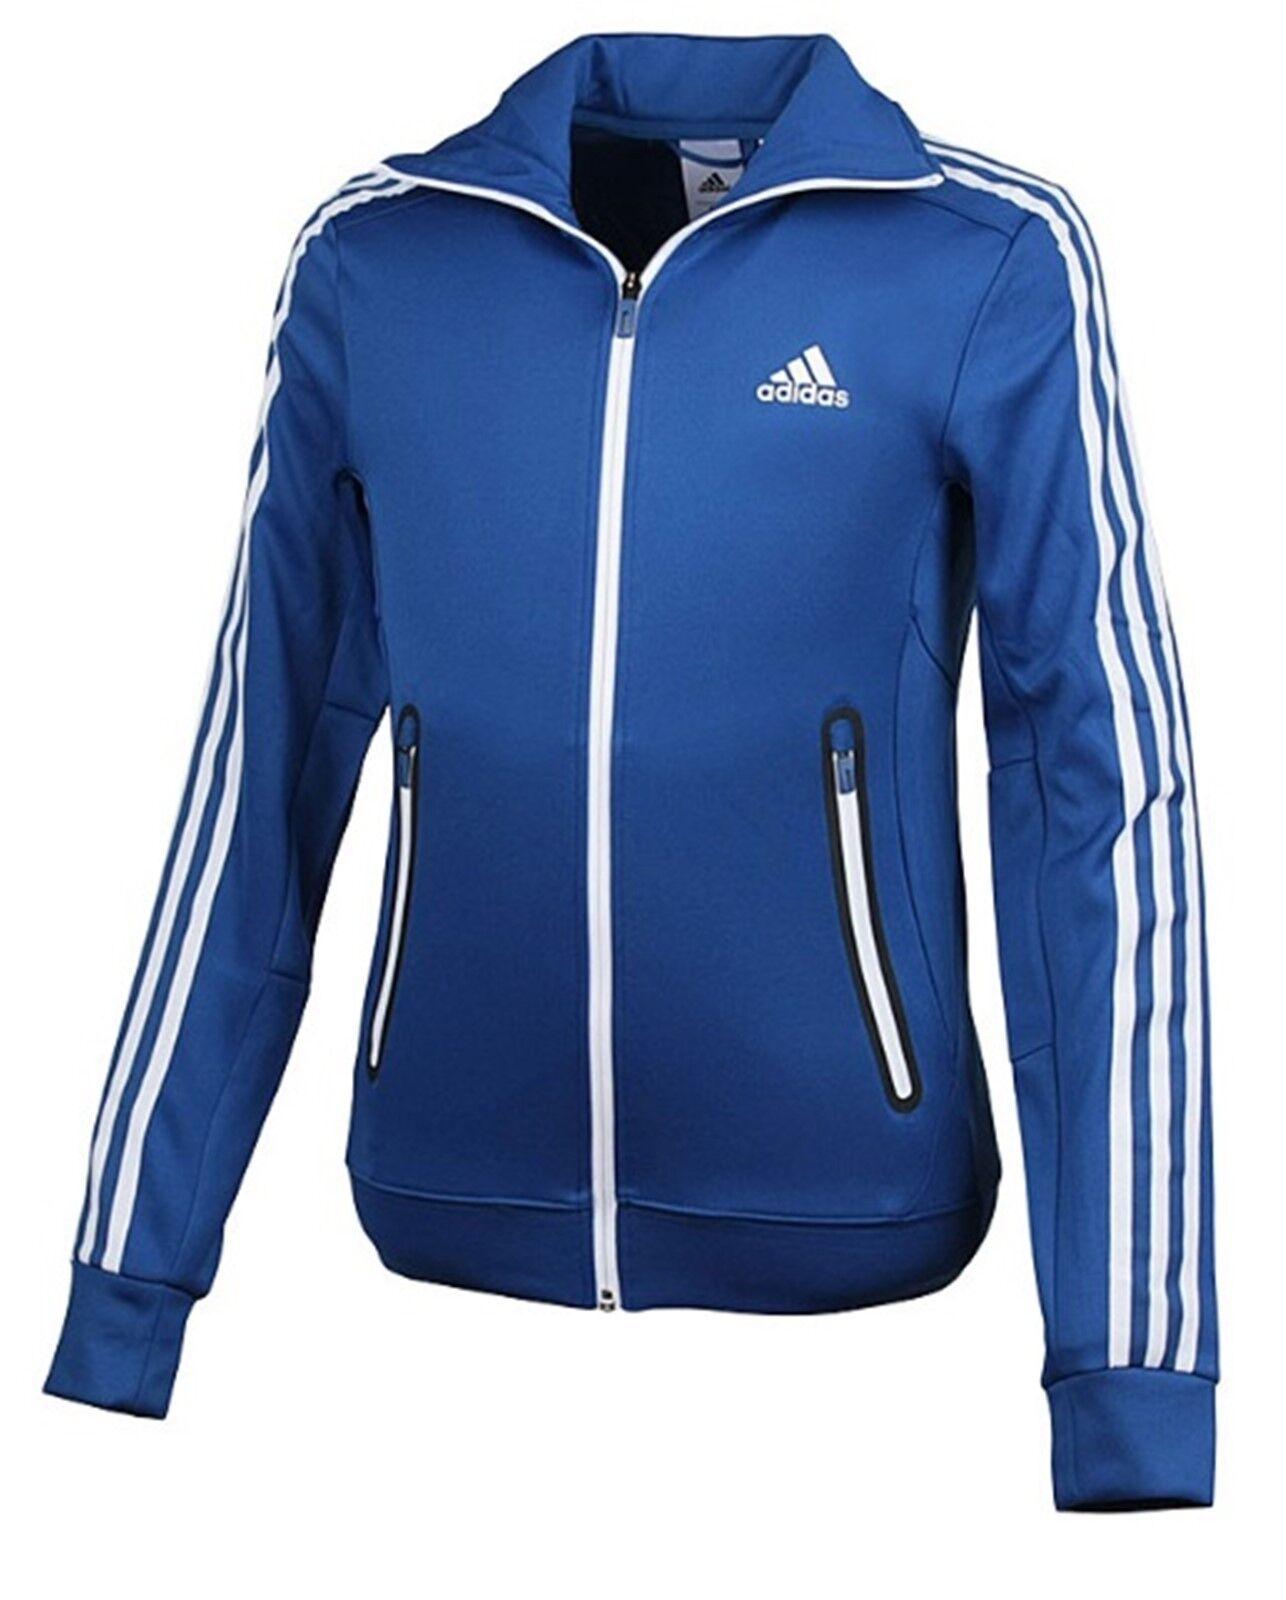 Adidas Men AK 3S Track Top Jacket Blau Soccer Running Shirts GYM Jackets AJ3645